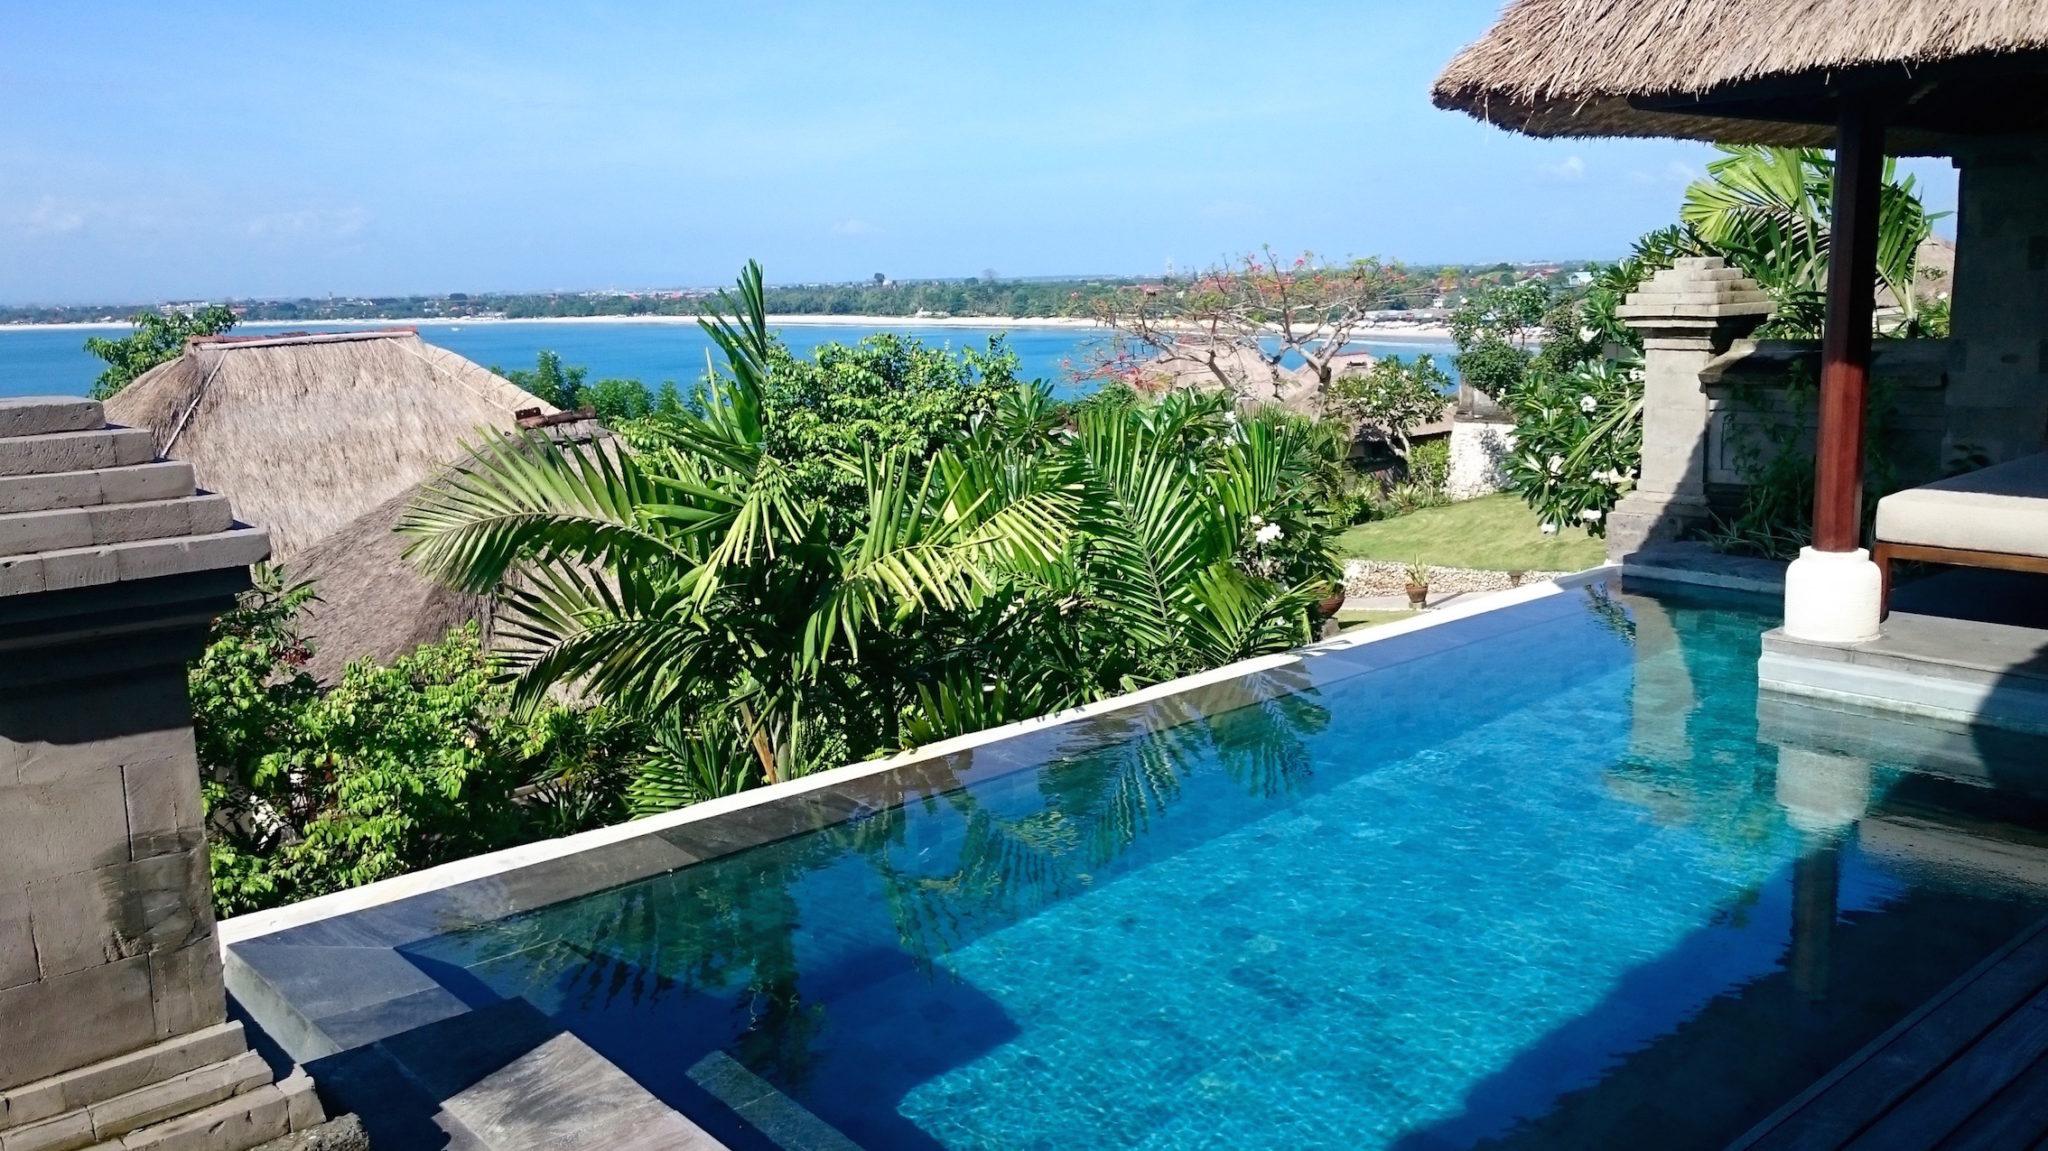 Jimbaran Beach Hotel